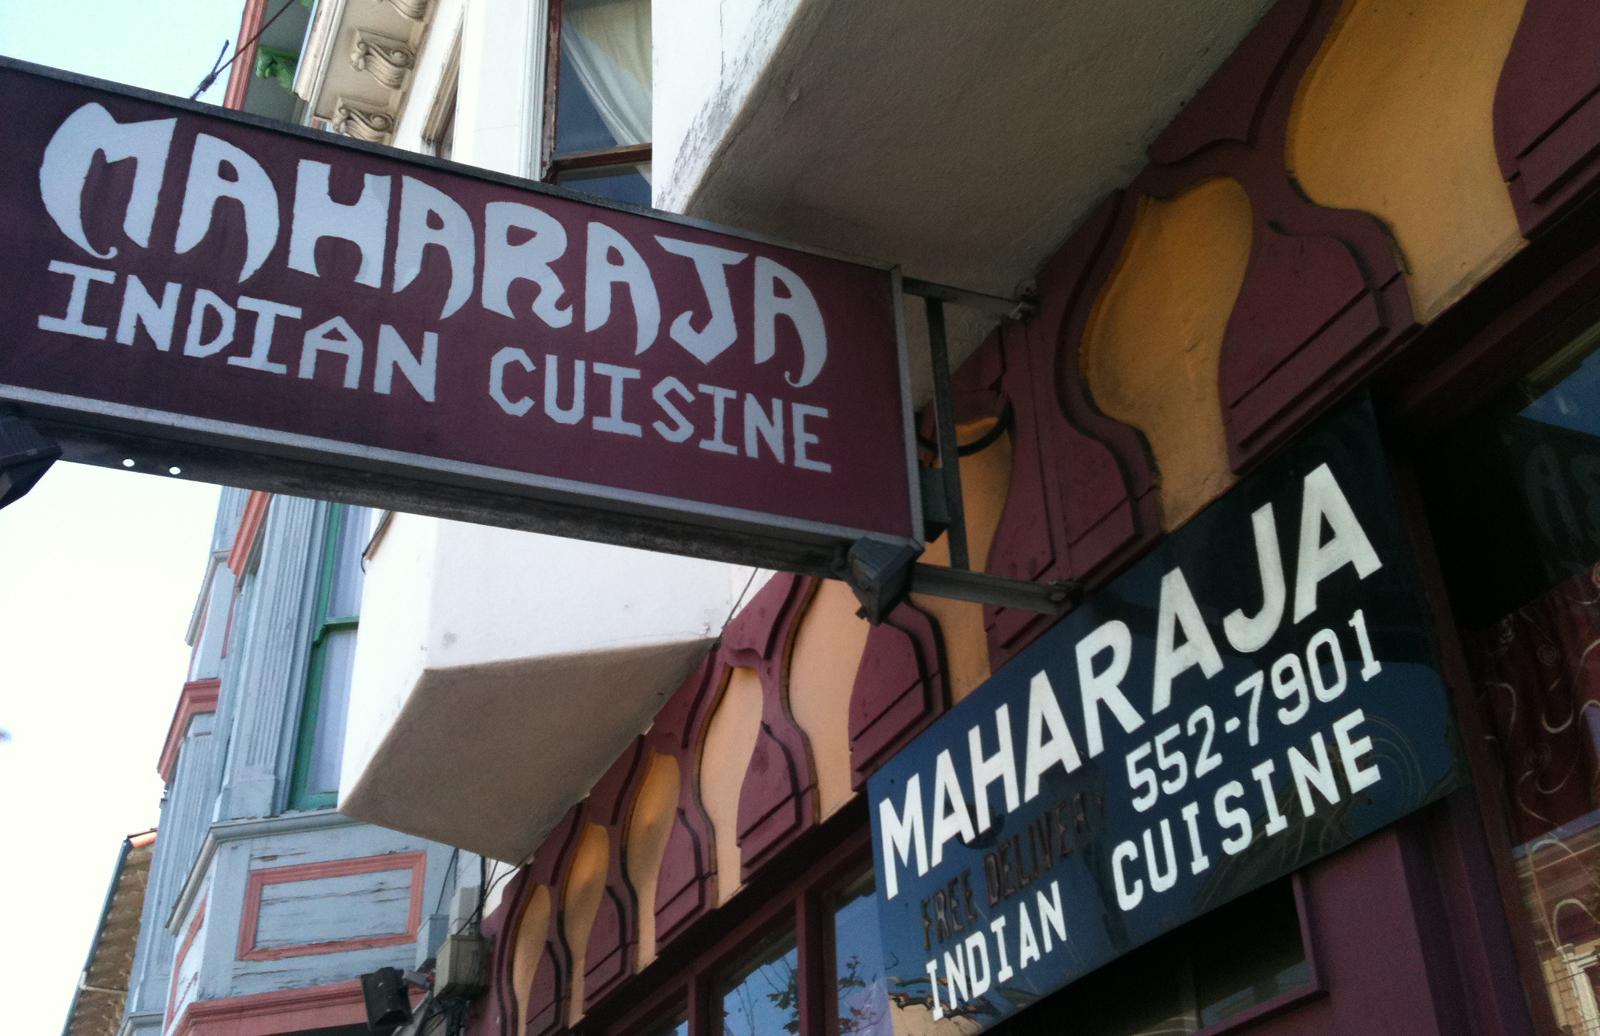 What Happened to Maharaja Indian Restaurant?